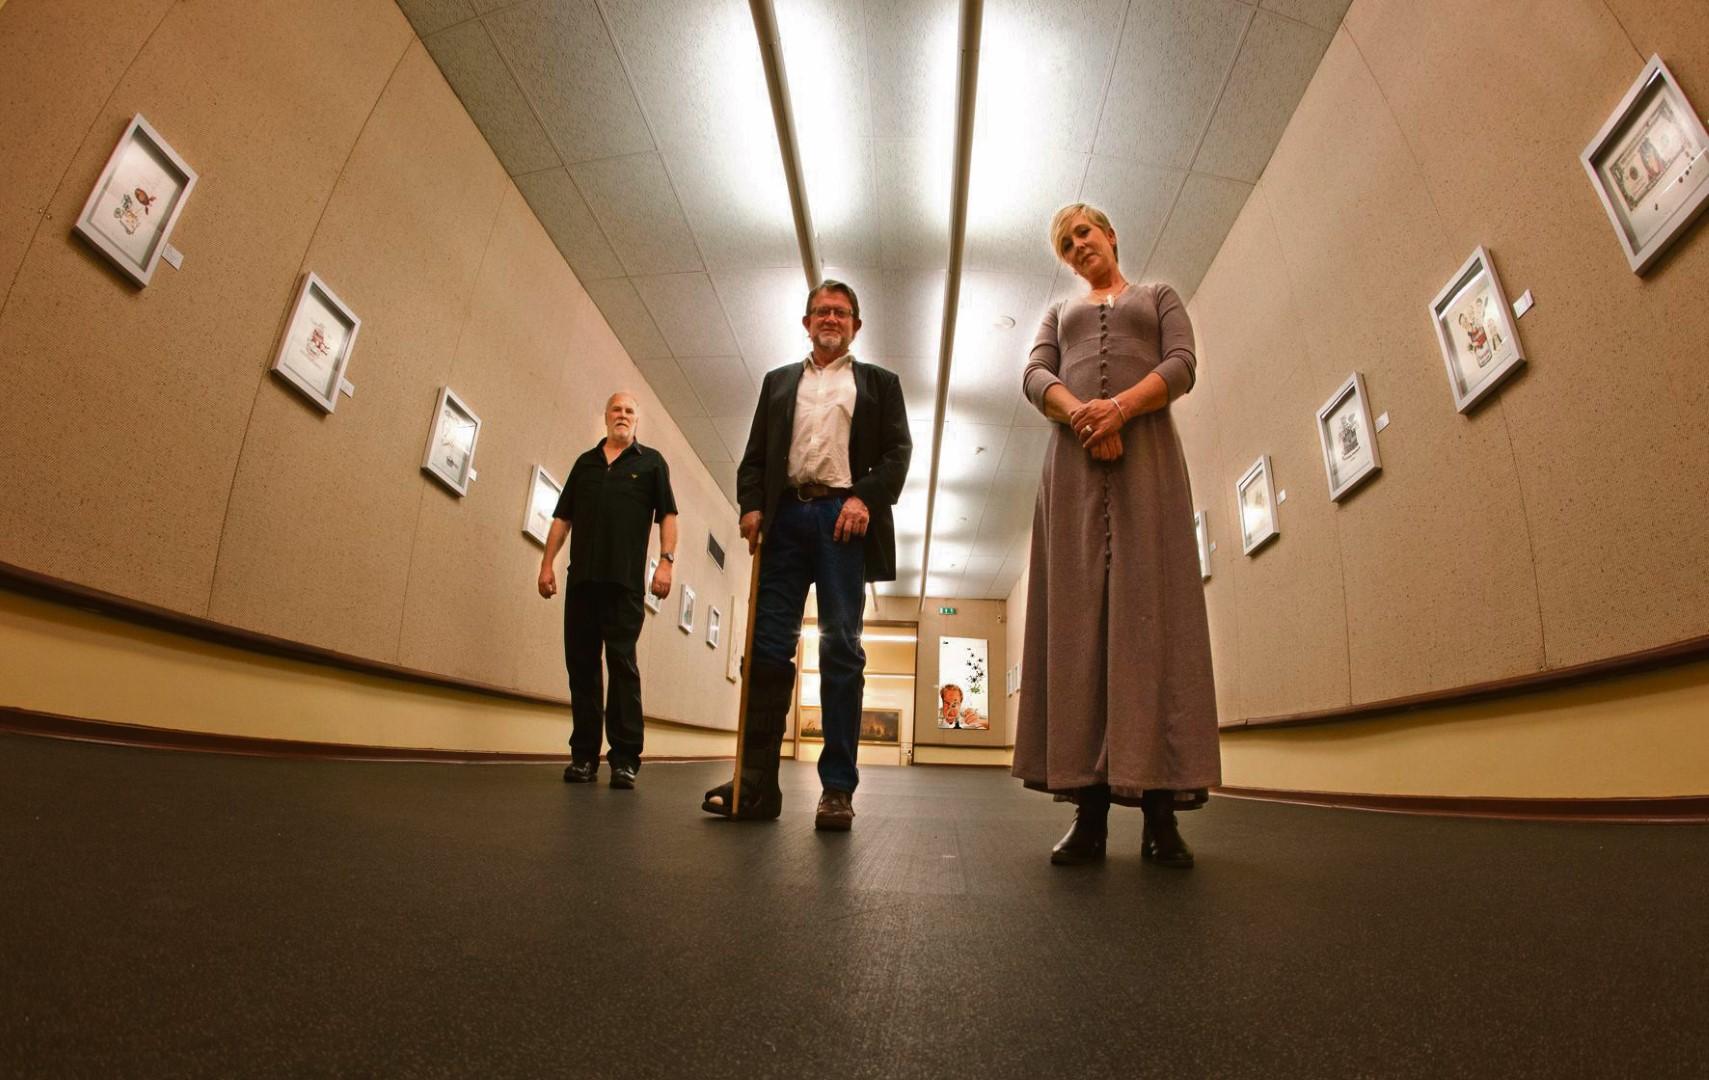 Prof. Attie Gerber, Rowland Daniel and Jody Olën